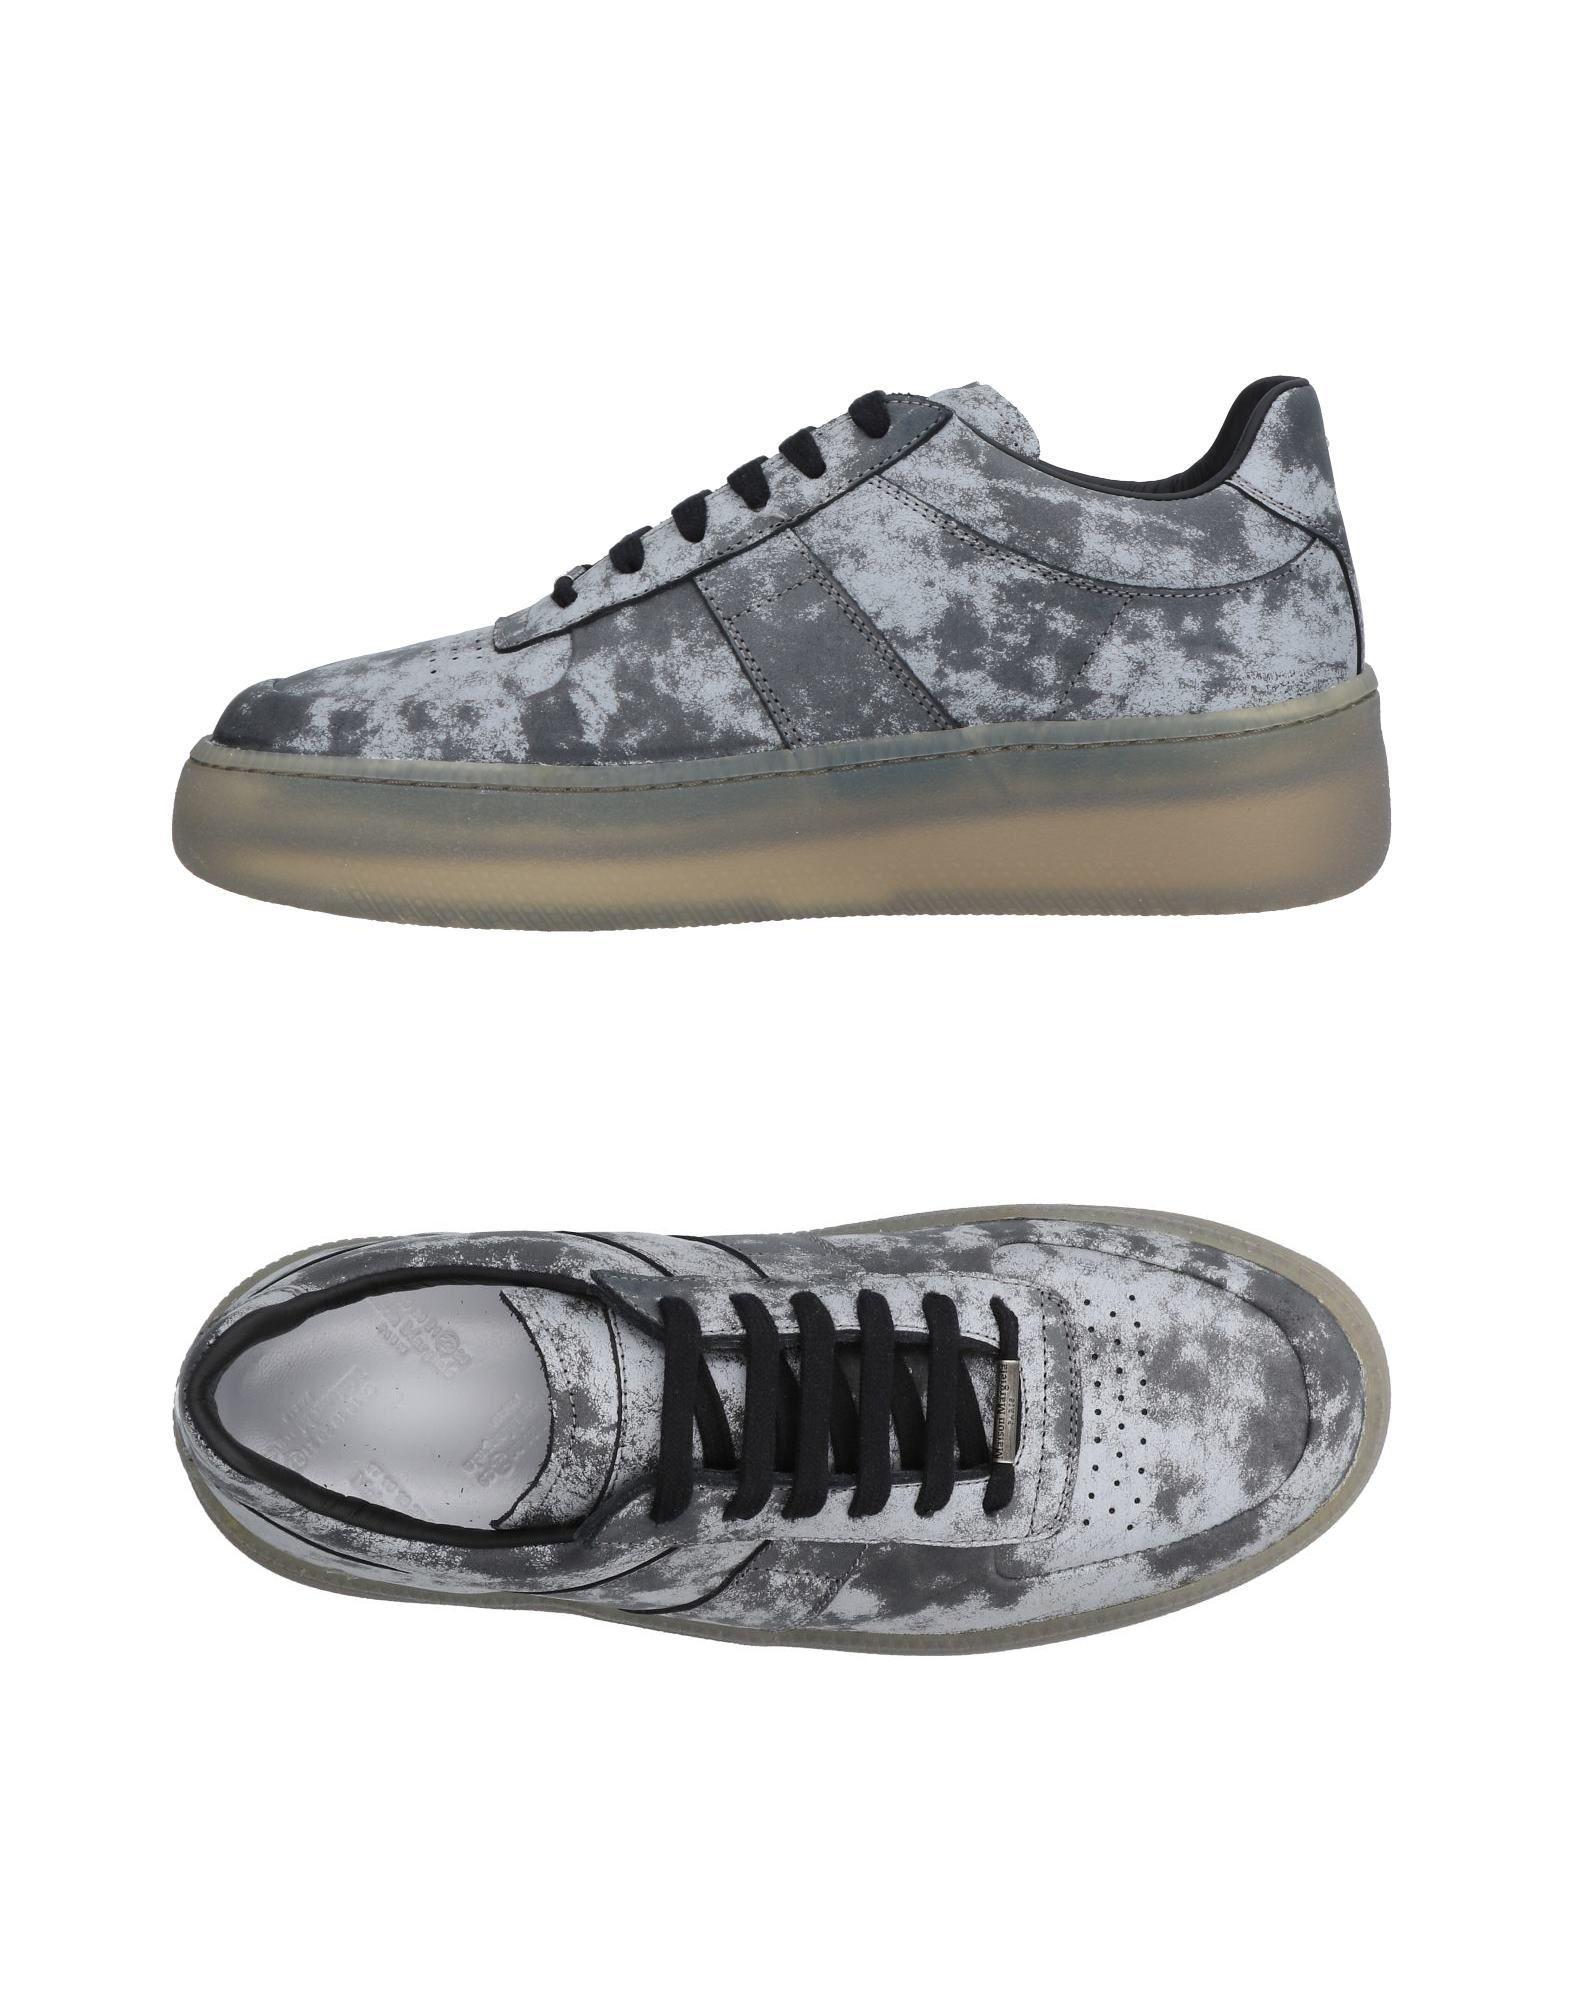 Maison Margiela Sneakers Herren  11471930VI Gute Qualität beliebte Schuhe